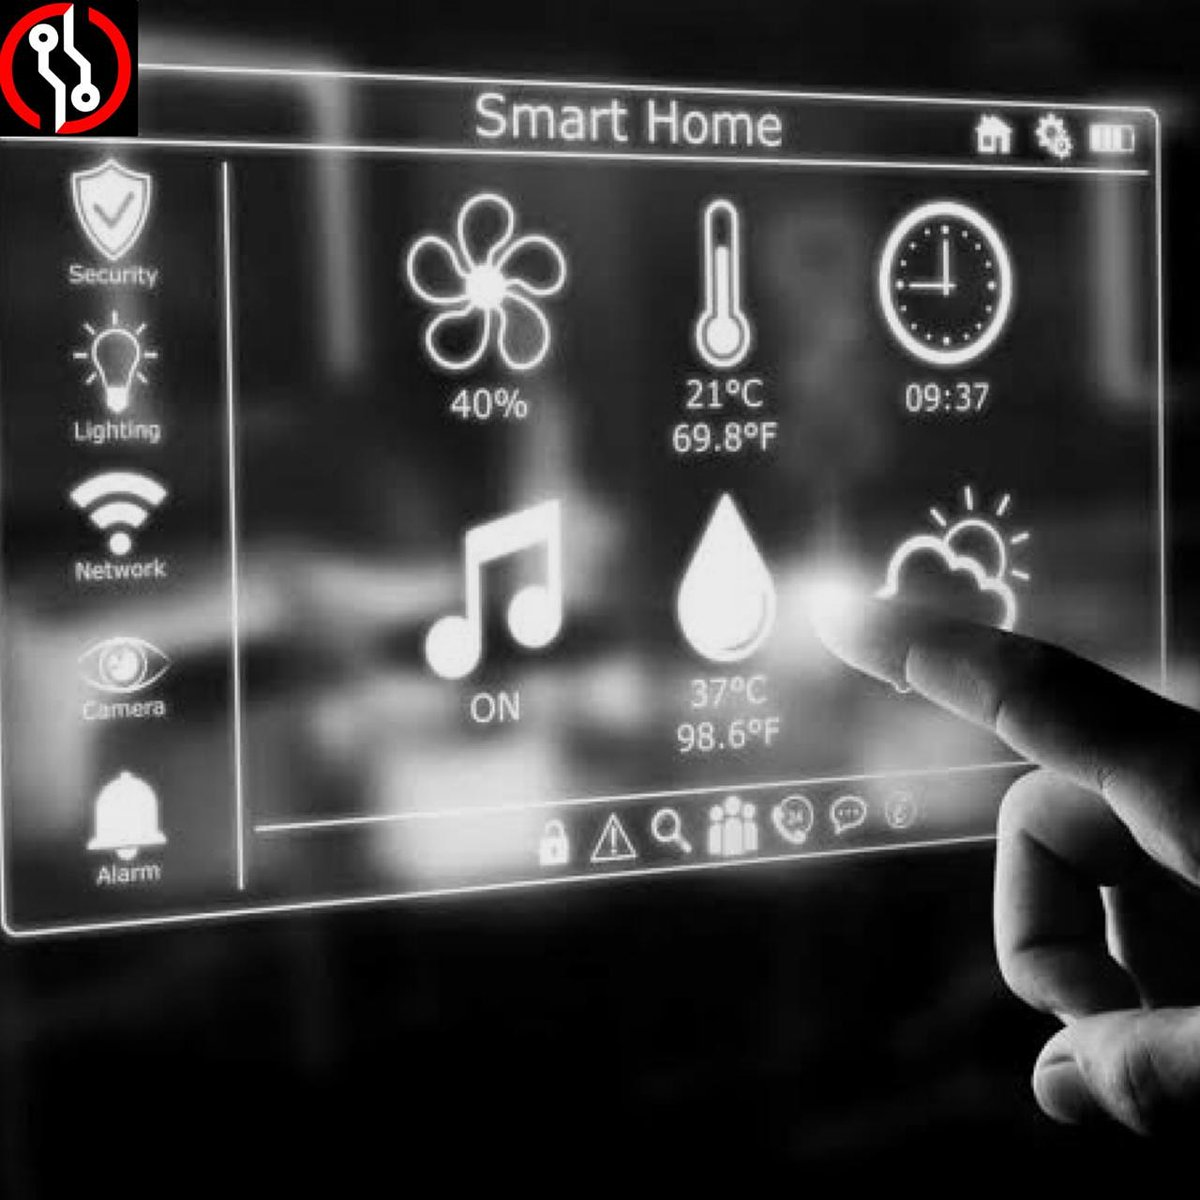 Smart living needs smart choices. #smarthome #smartlock #smartlighting #smartswitches #smartautomation #drawerlock #smartworld #smartcurtain #products #interiordesignideas #interiordesign #interiordesigner #trending #trendingproducts #smarttechnology #hometechnology #homedecorpic.twitter.com/8vTVhnabj5